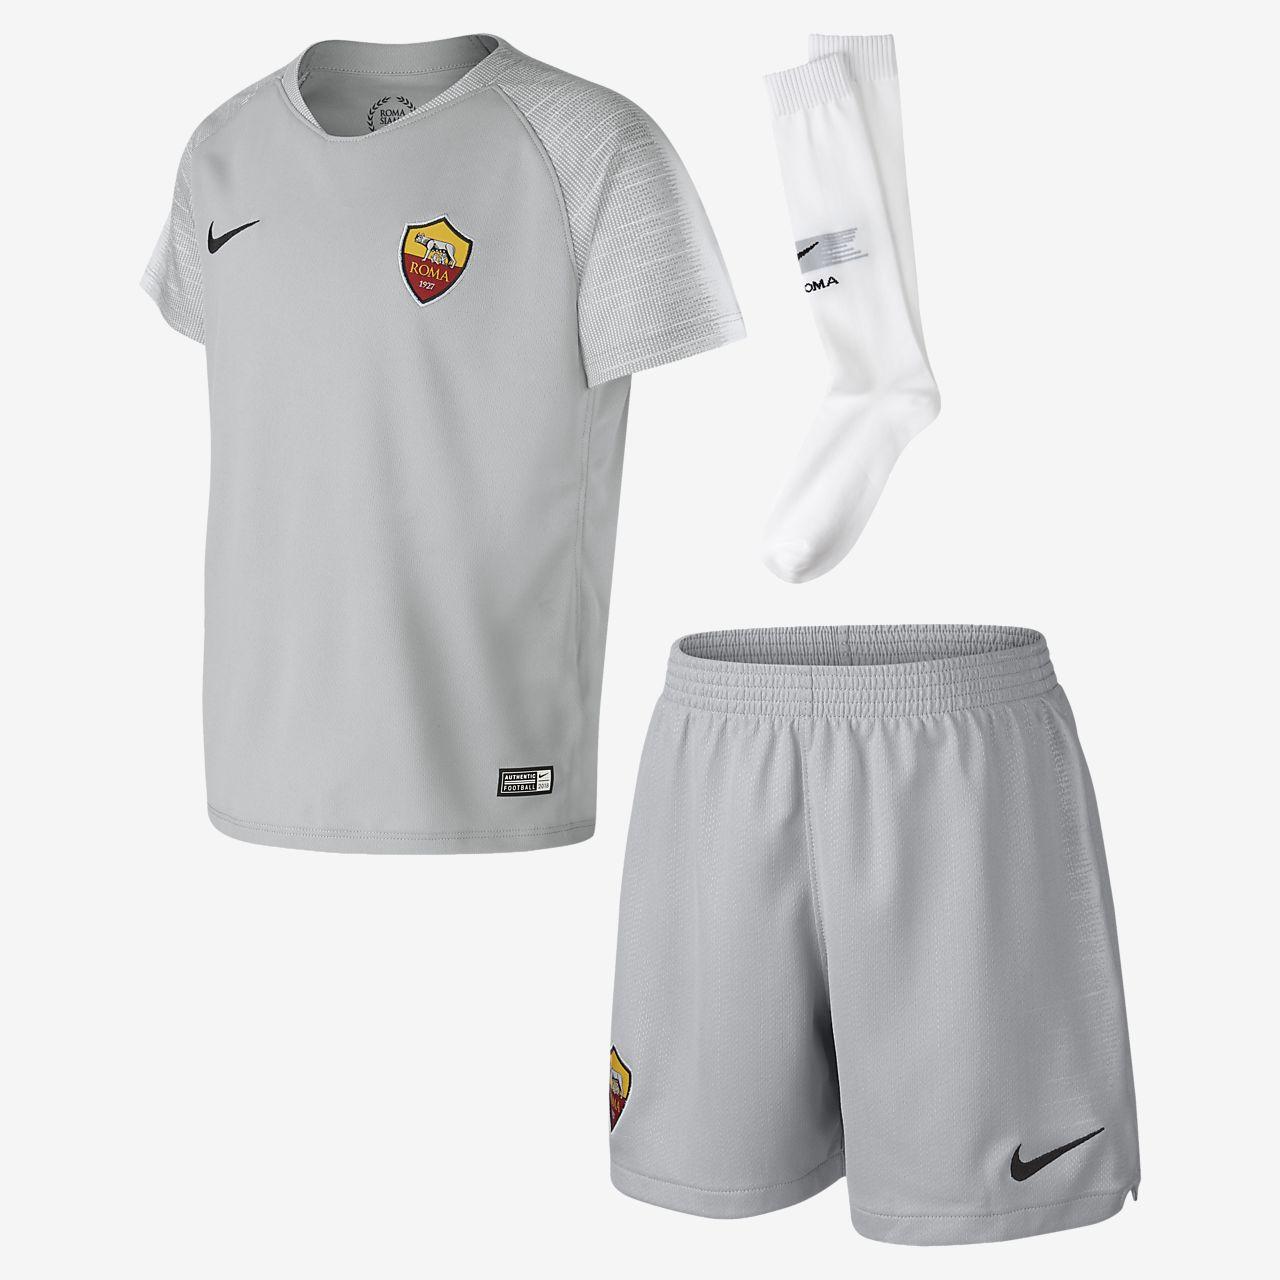 a185545f44d76 ... Kit de fútbol de visitante para niños talla pequeña Stadium del A.S.  Roma 2018 19